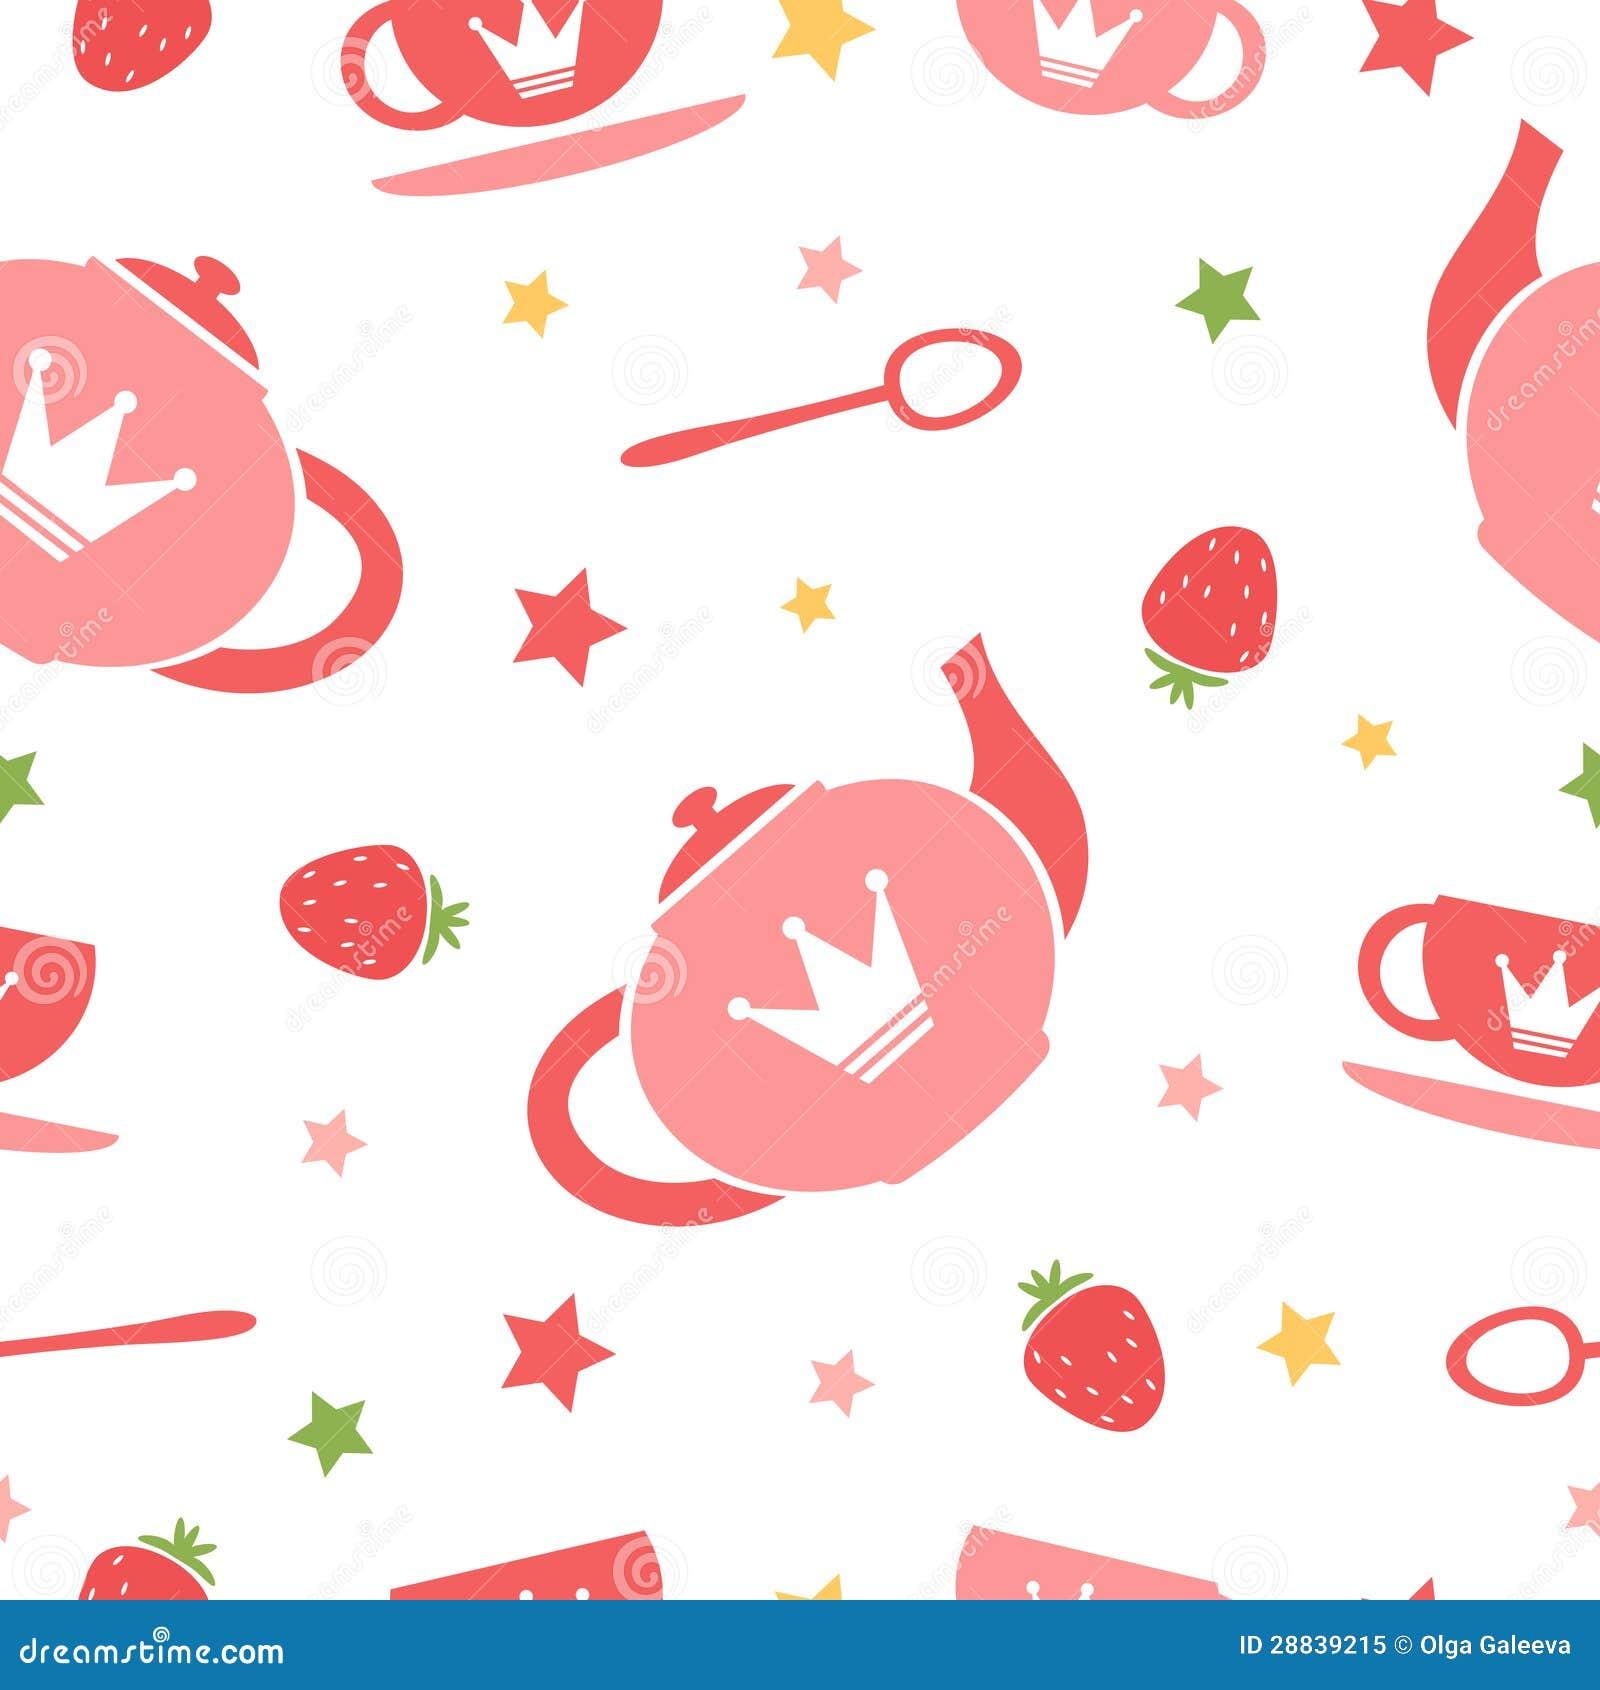 Tea party background royalty free stock photo image 28839215 - Royalty Free Stock Photo Background Cute Seamless Tea